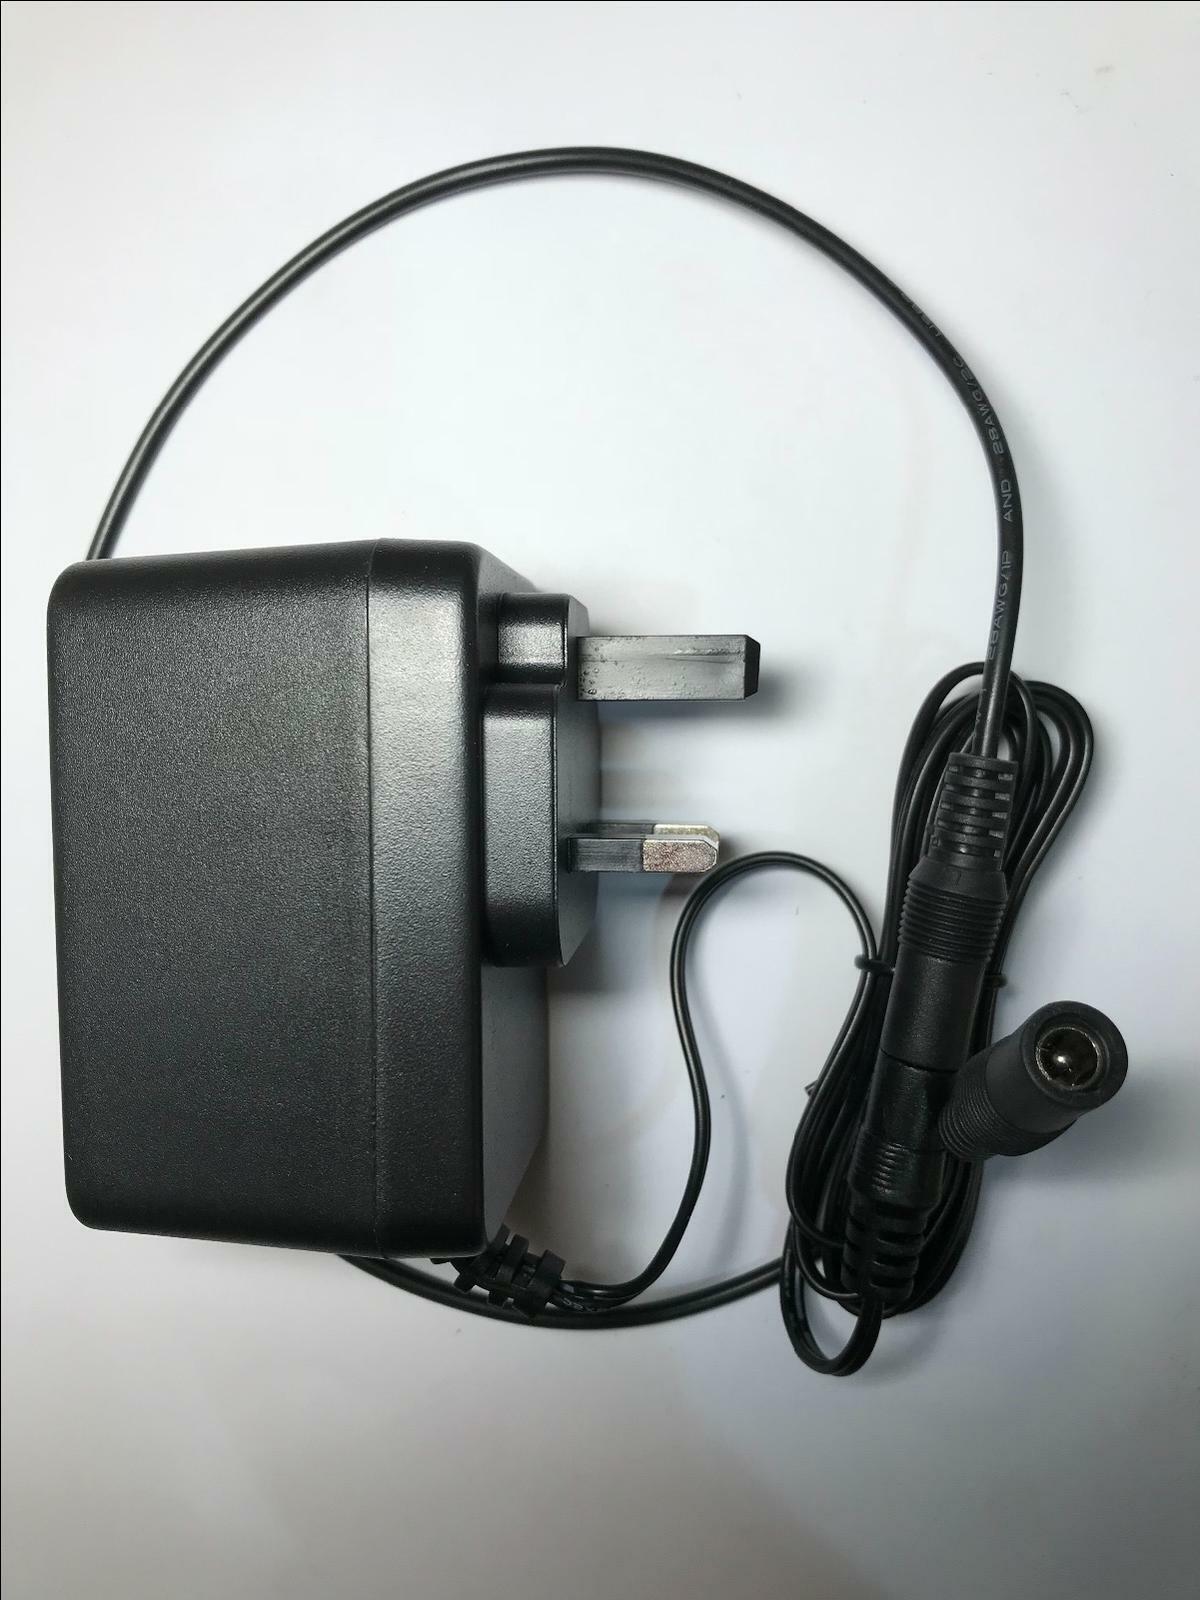 12V AC-AC Linear Adaptor Power Supply with Female 5.5mm x 2.1mm Hole 4 XMAS Tree